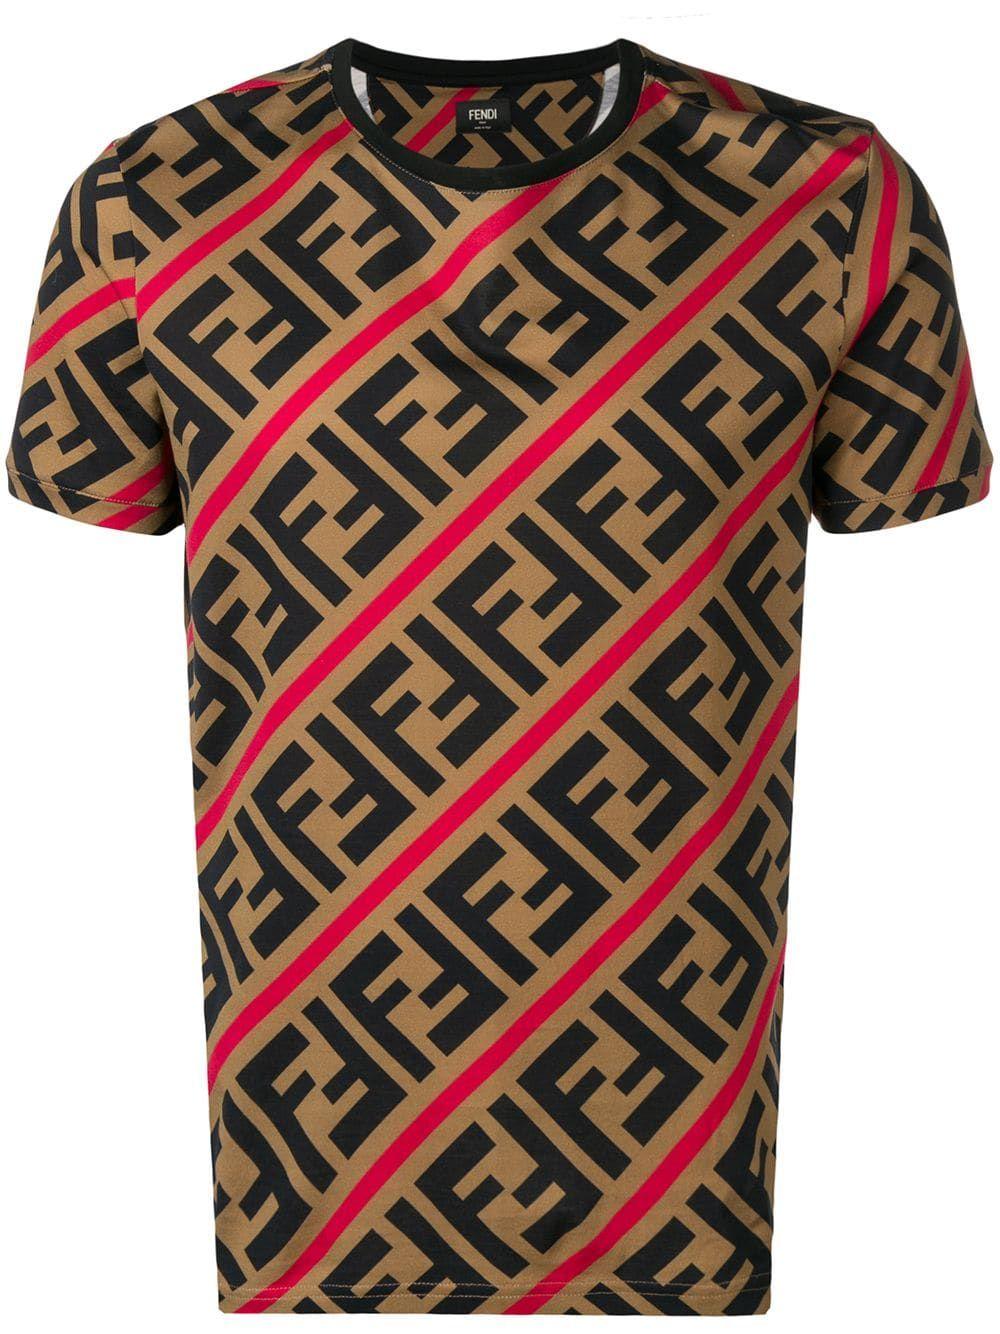 Fendi Double F Logo Tshirt in 2020 Fendi, Fendi